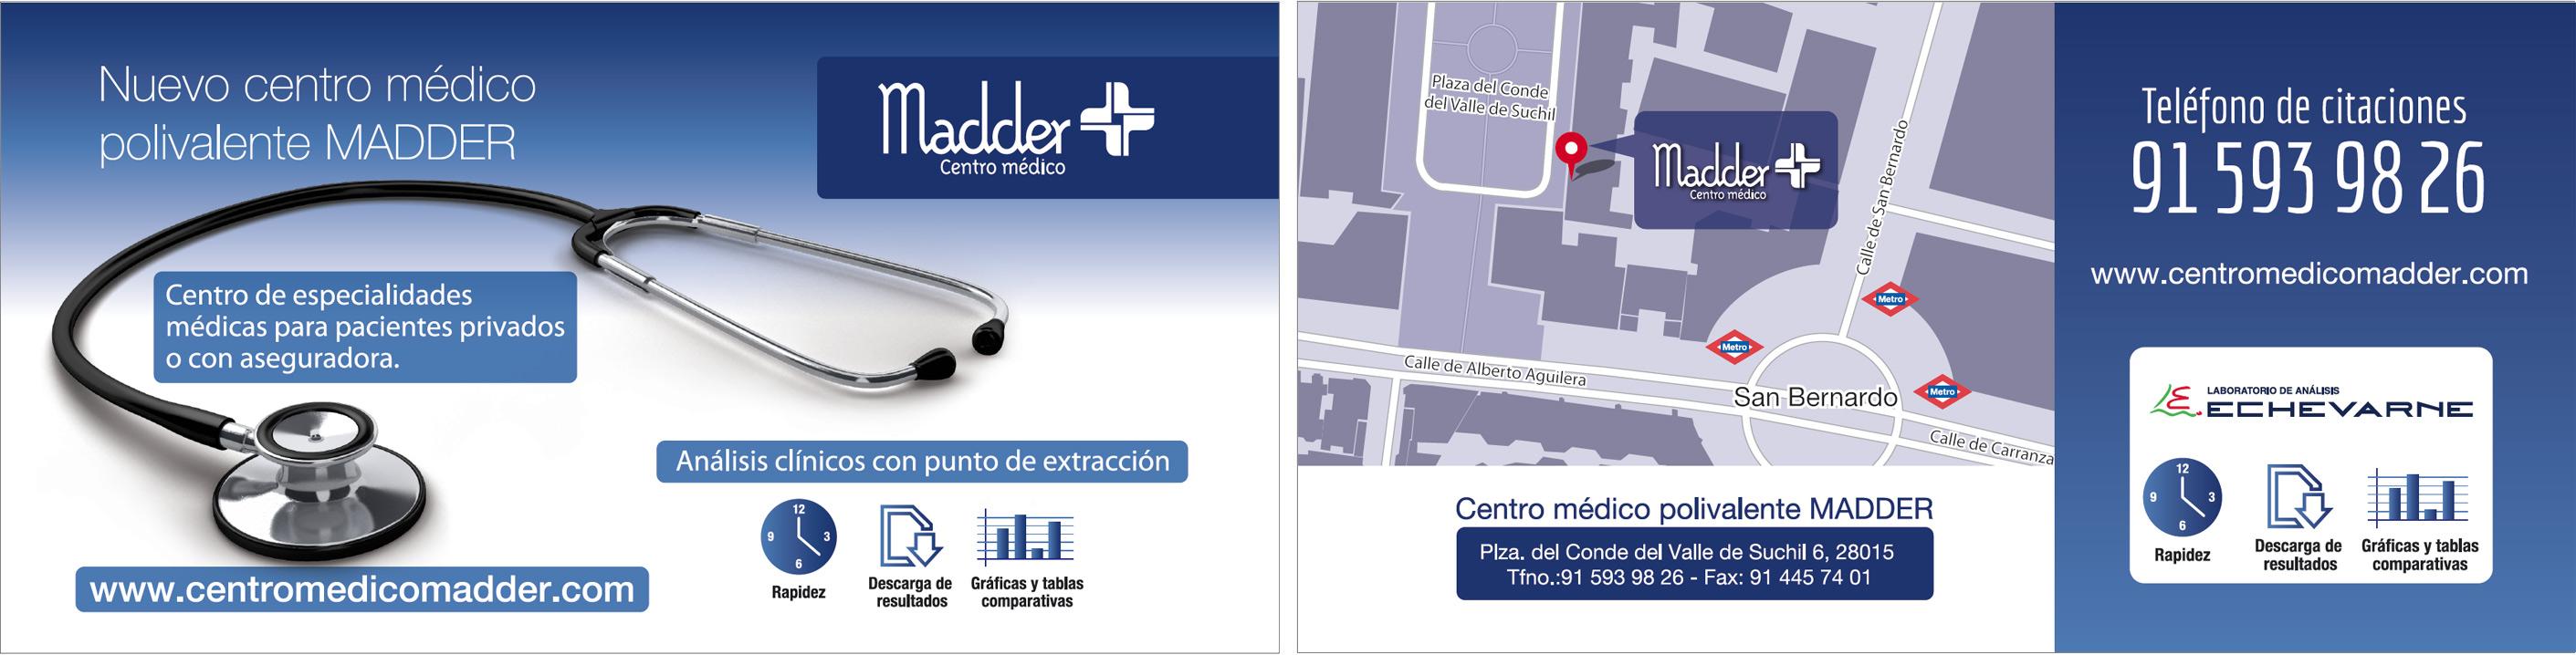 flyer_madder